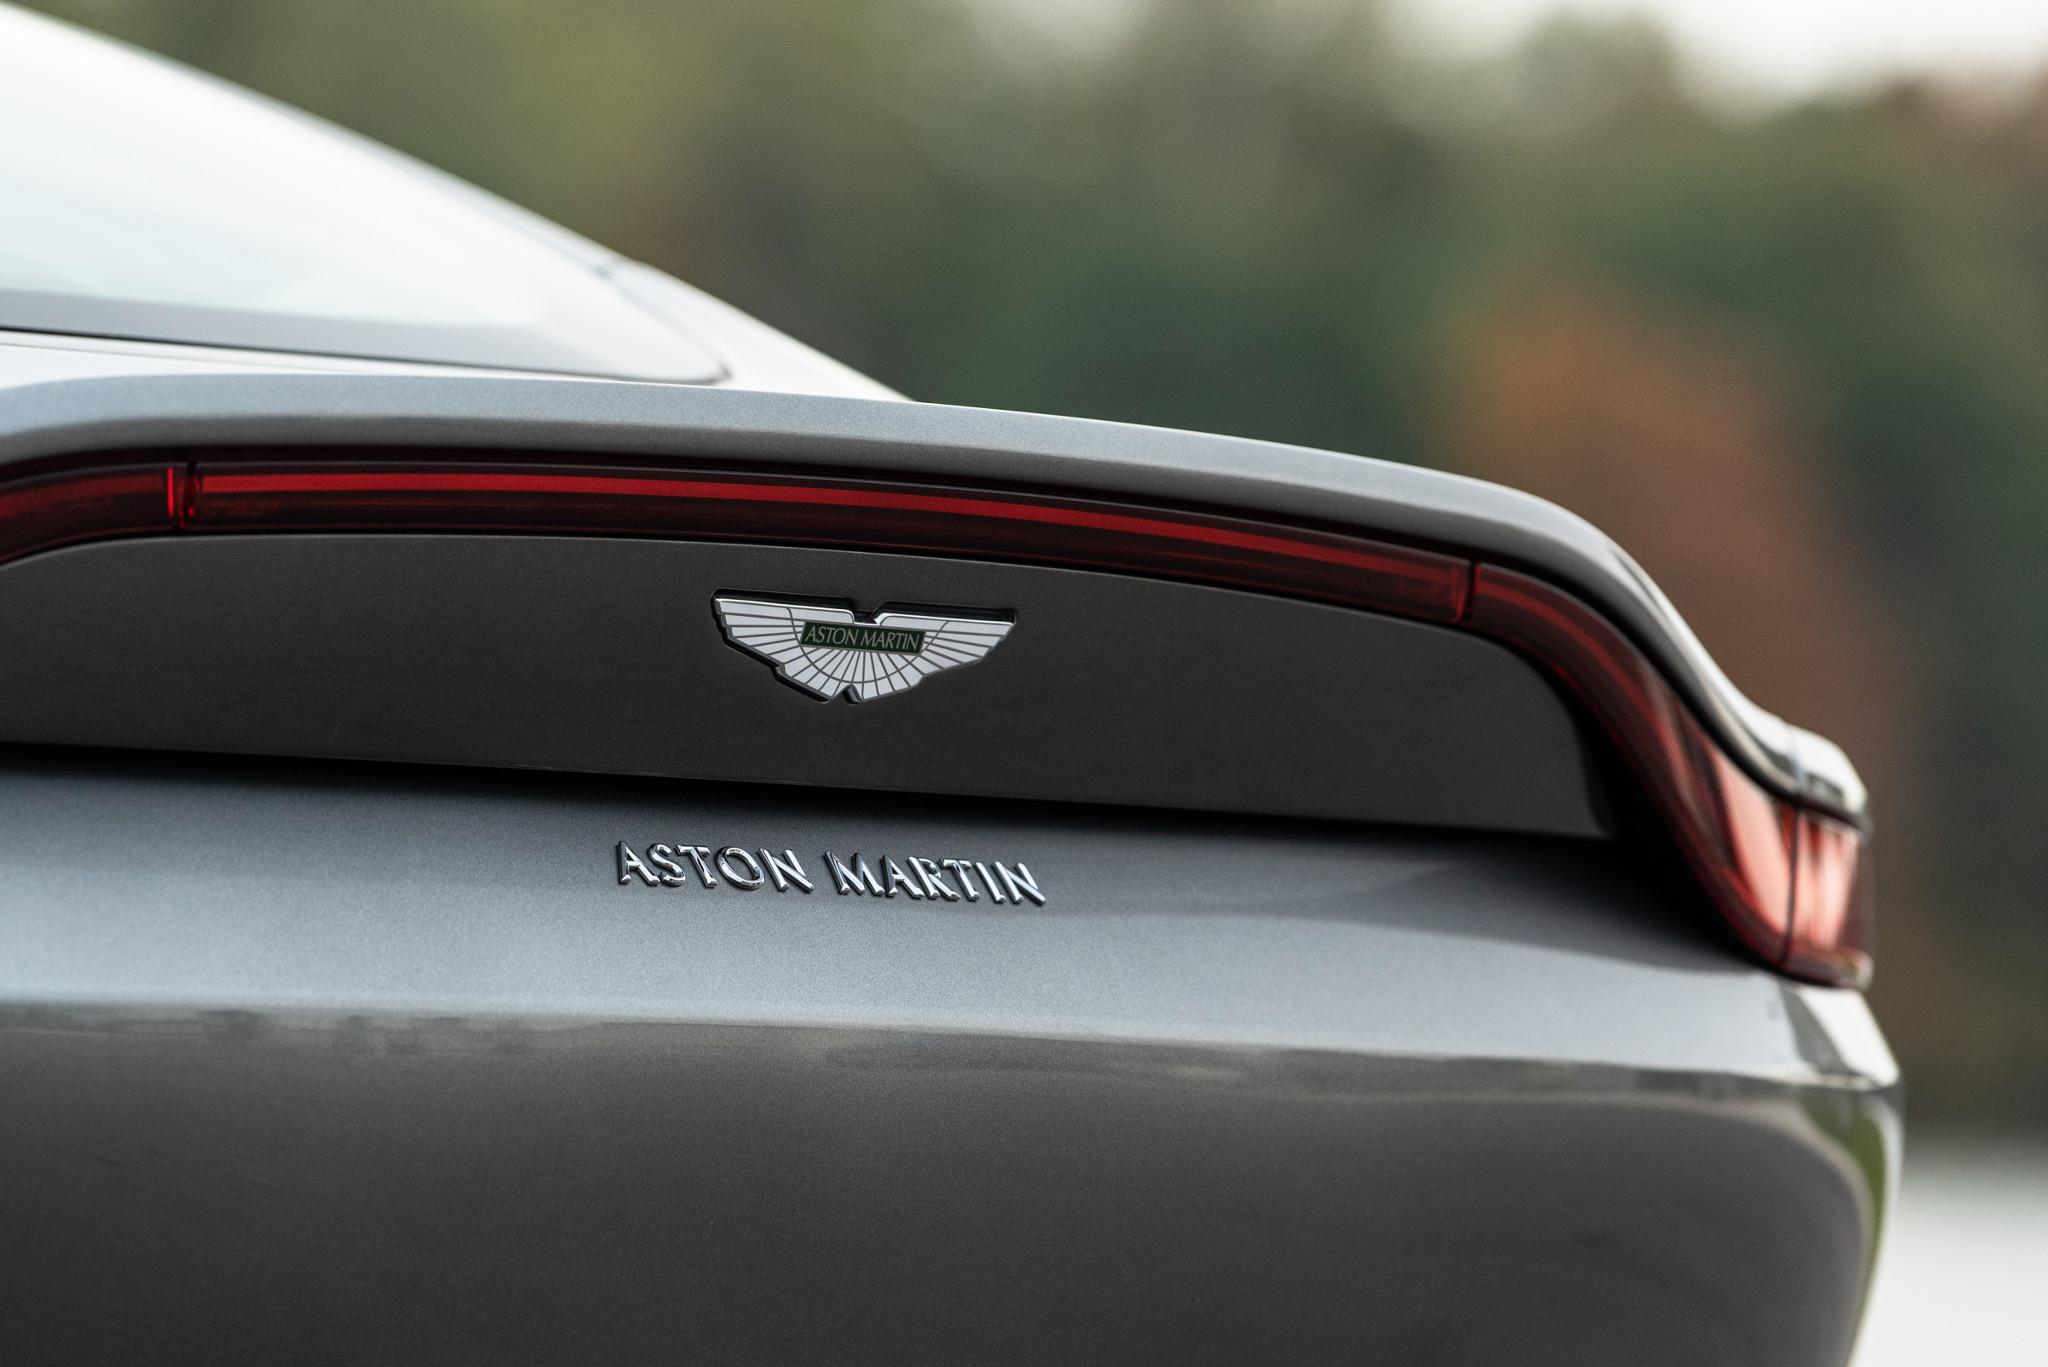 14-aston-martin-vantage-2018-badge--exterior--rear--silver.jpg